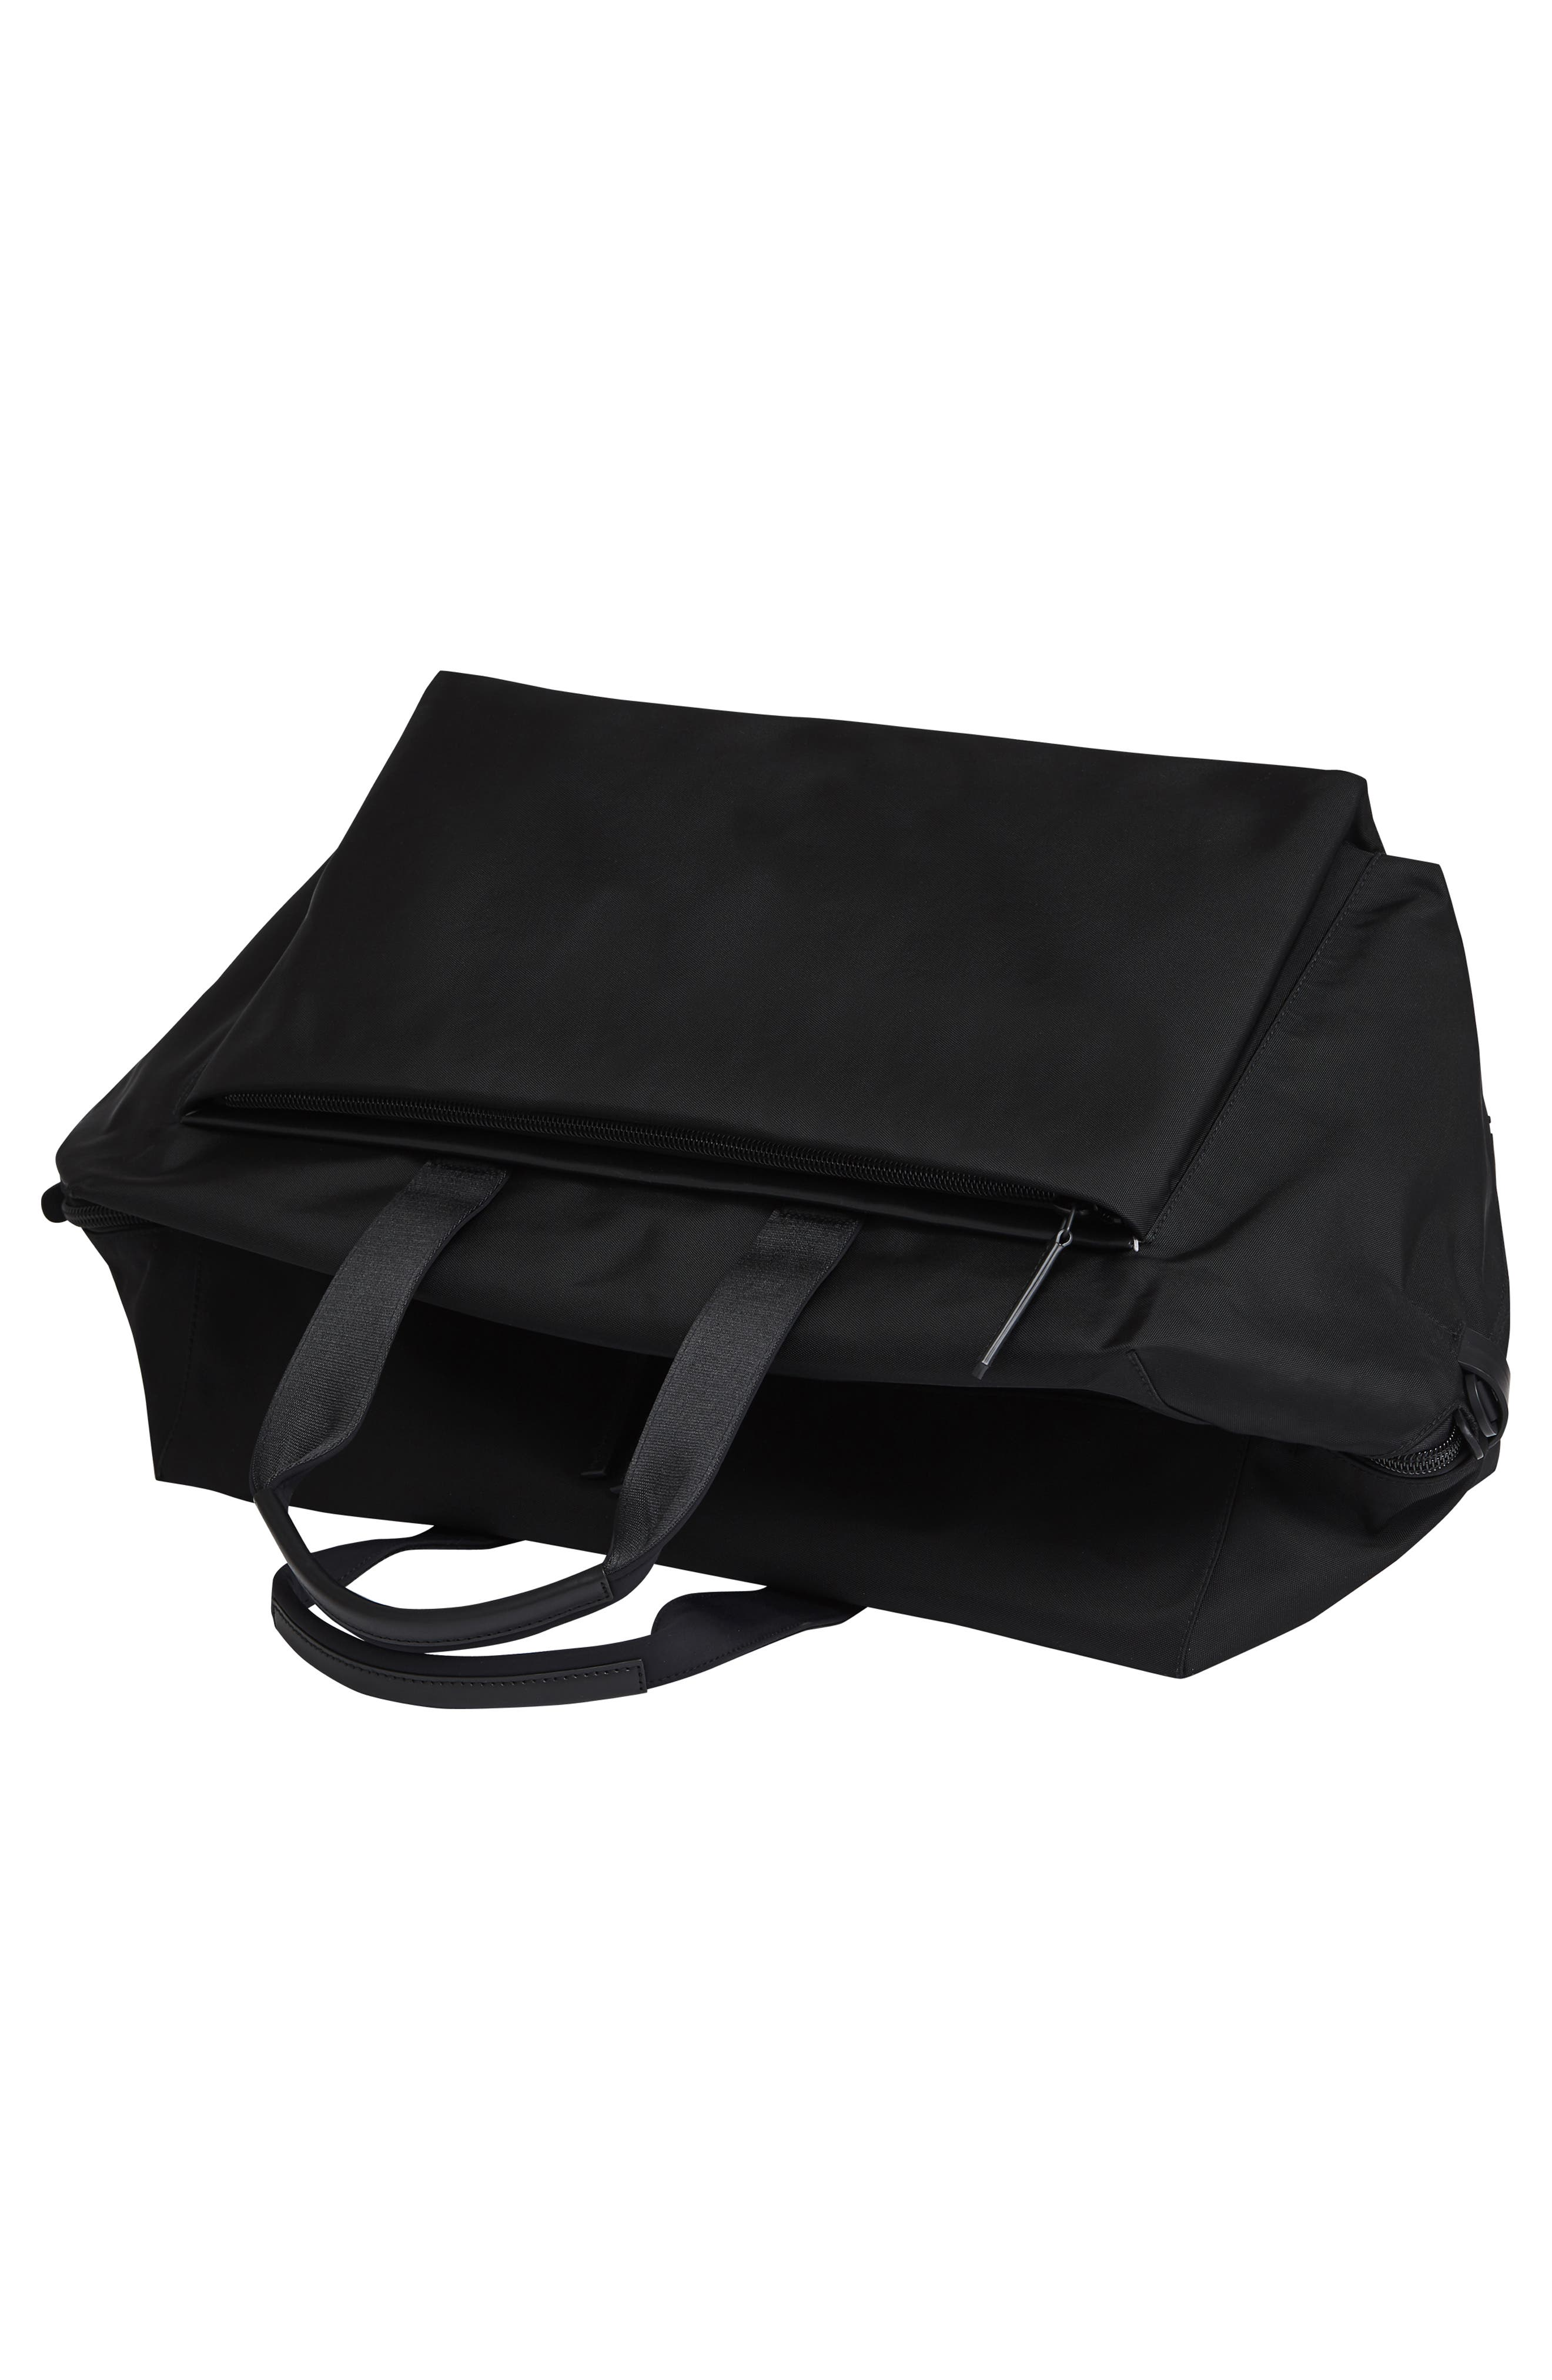 Lightweight Duffel Bag,                             Alternate thumbnail 2, color,                             Black Nylon/ Black Leather